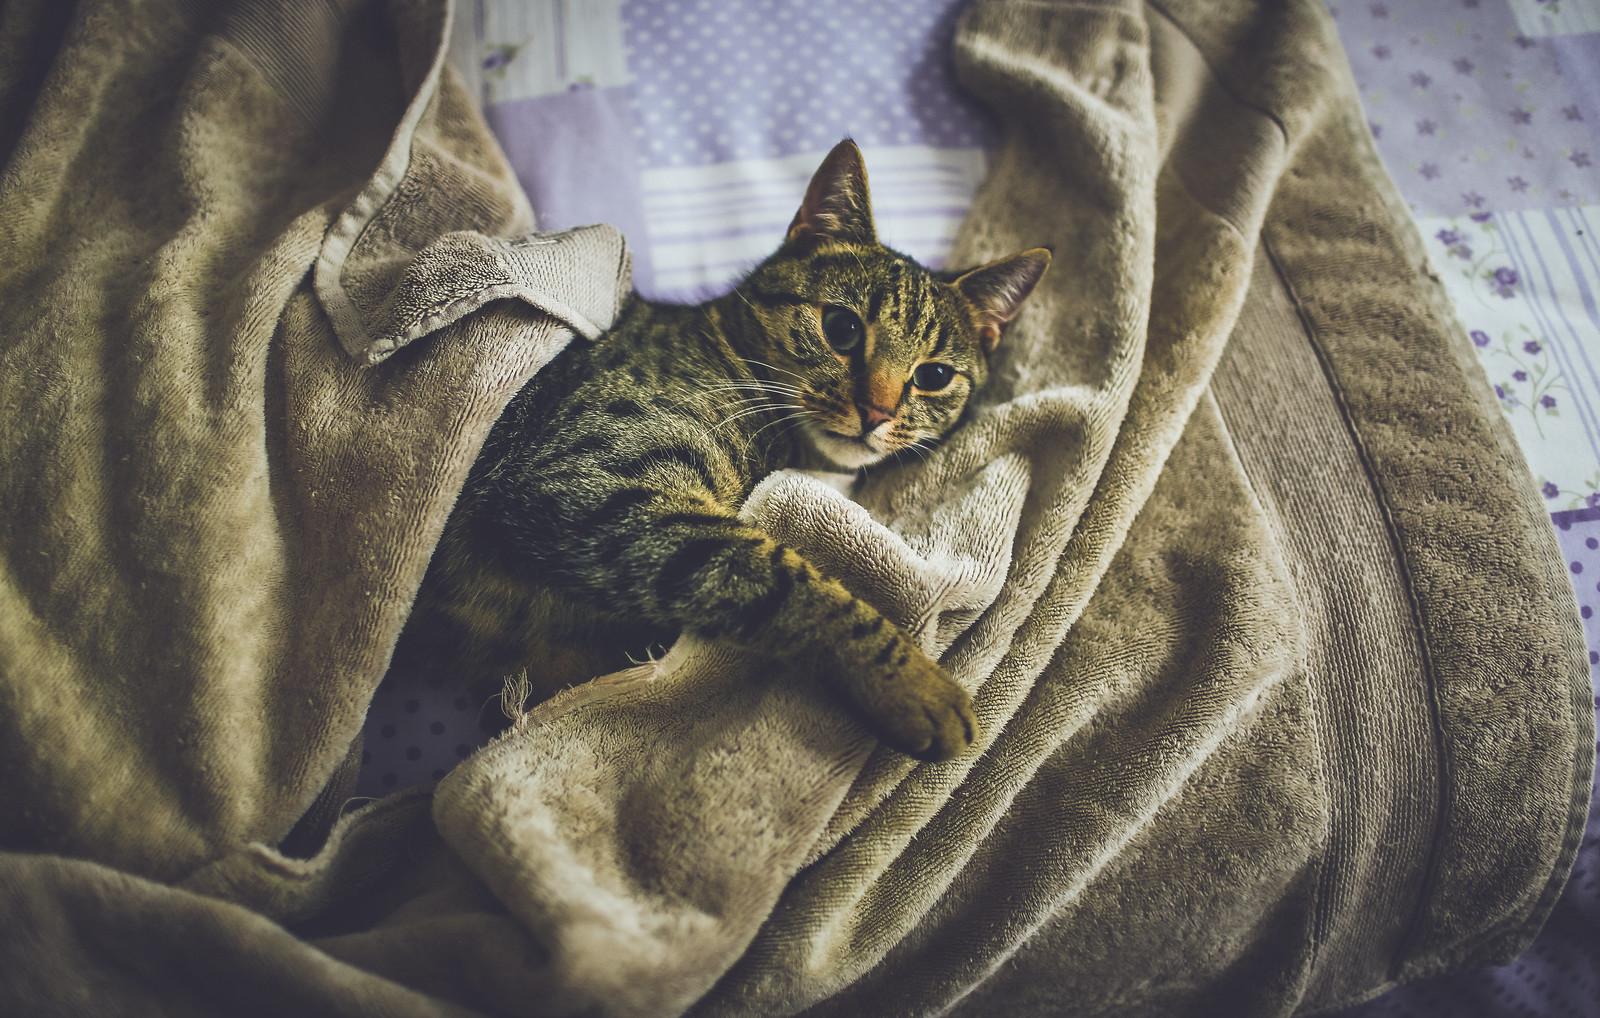 My cat likes damp bath towels